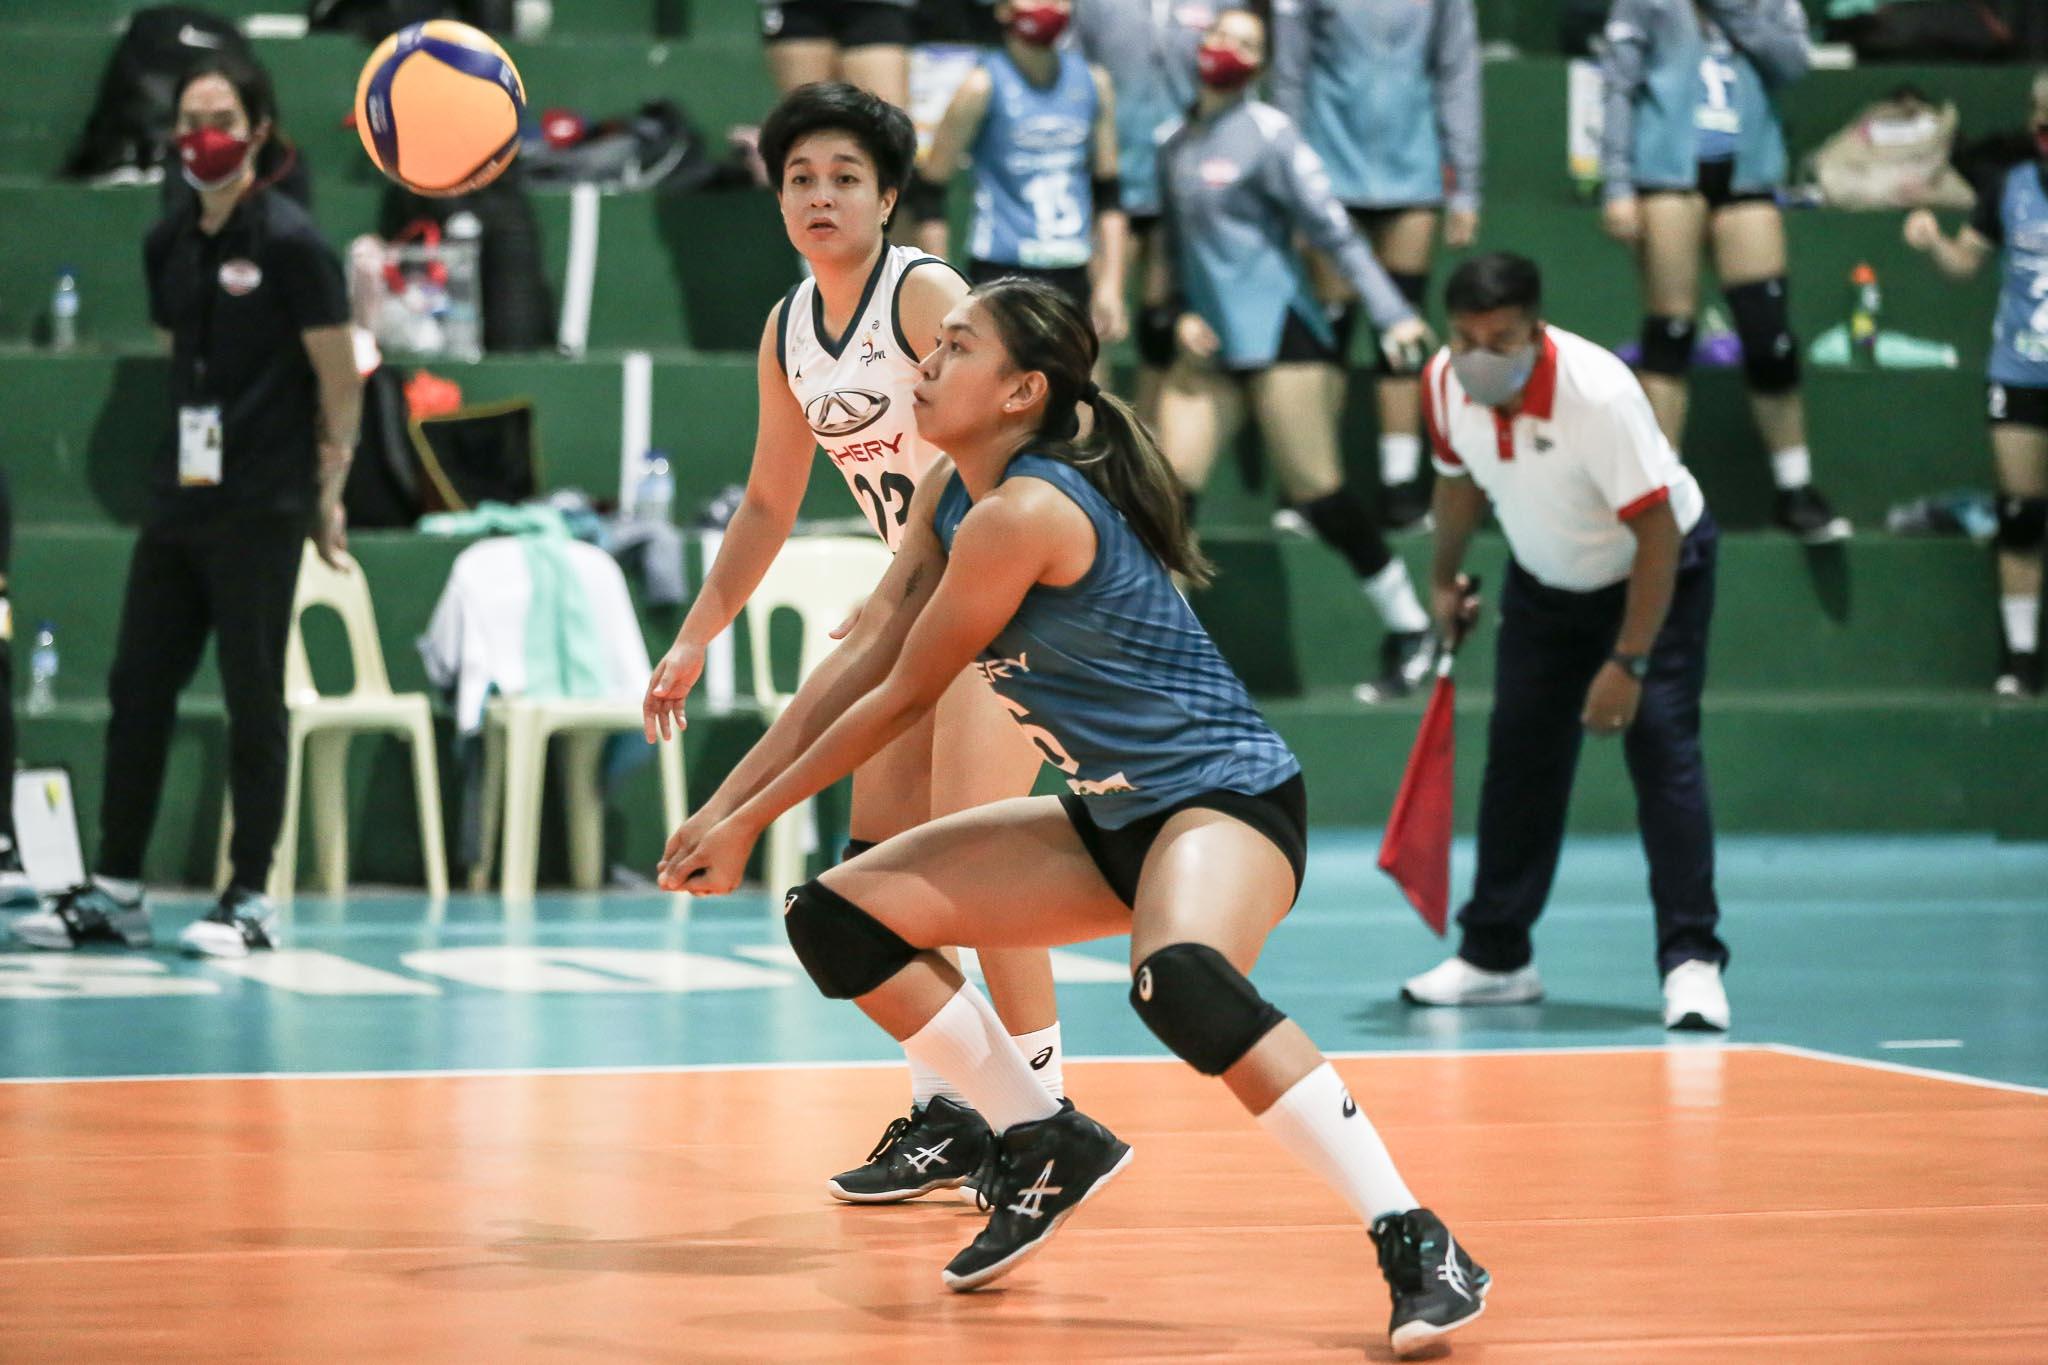 PVL-2021-Chery-Tiggo-vs-PLDT-Arianne-Layug-Chery Velez believes Dacoron, Nabor will be pivotal in Chery Tiggo's campaign News PVL Volleyball  - philippine sports news